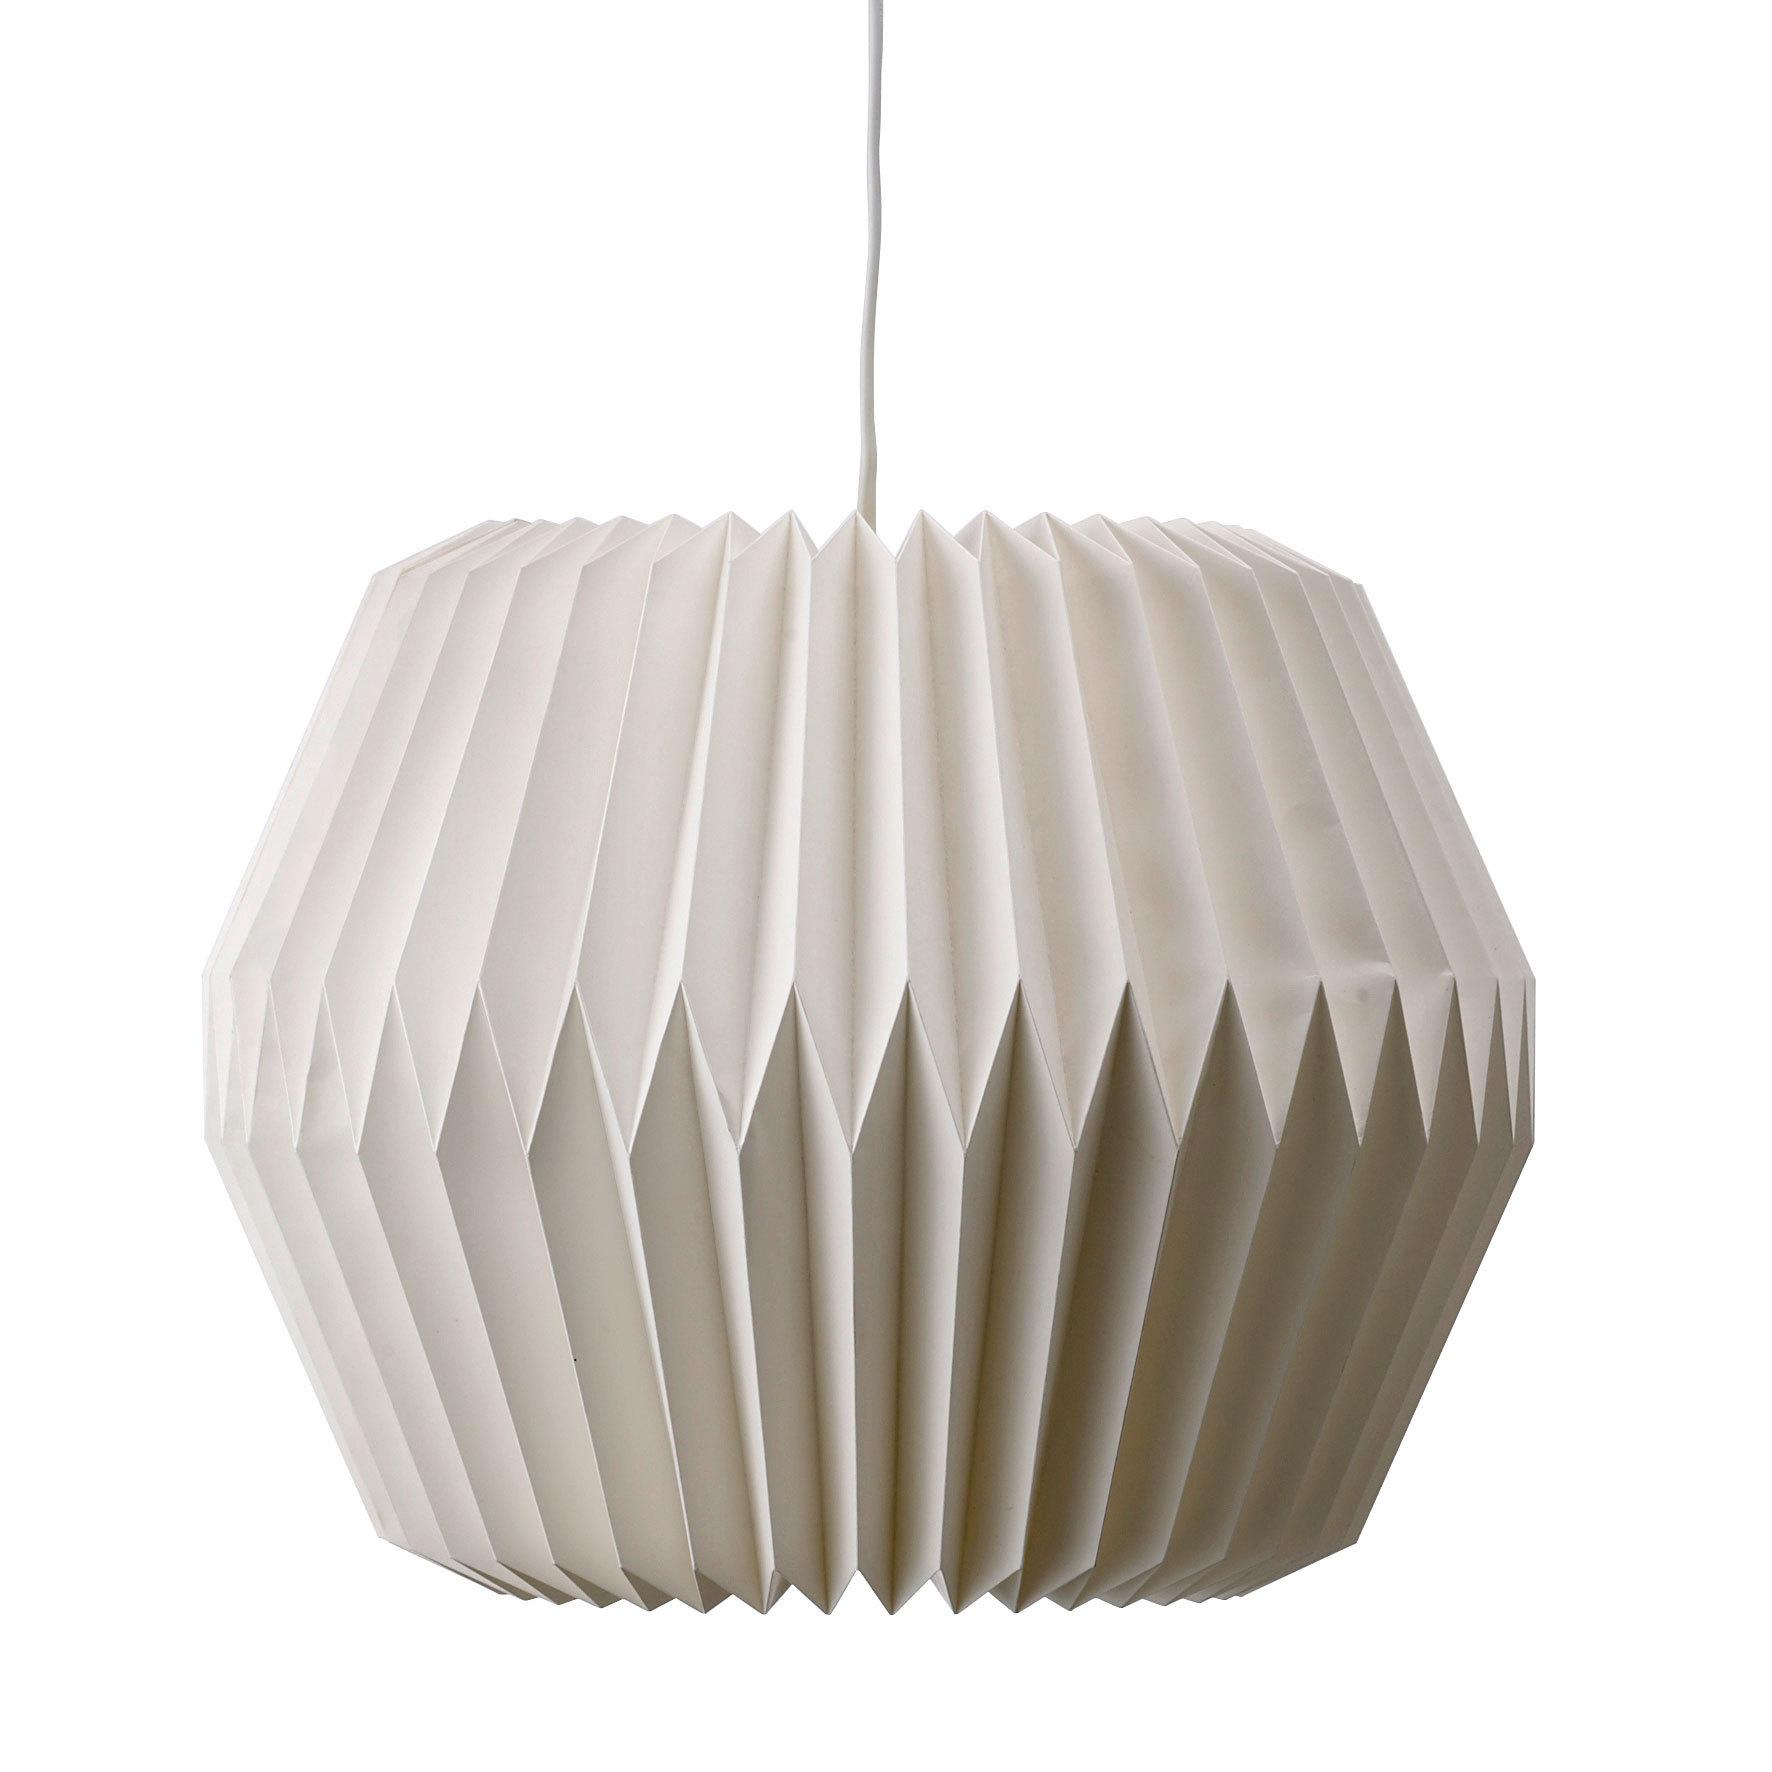 emil paula bloomingville lampe white paper 1 online. Black Bedroom Furniture Sets. Home Design Ideas